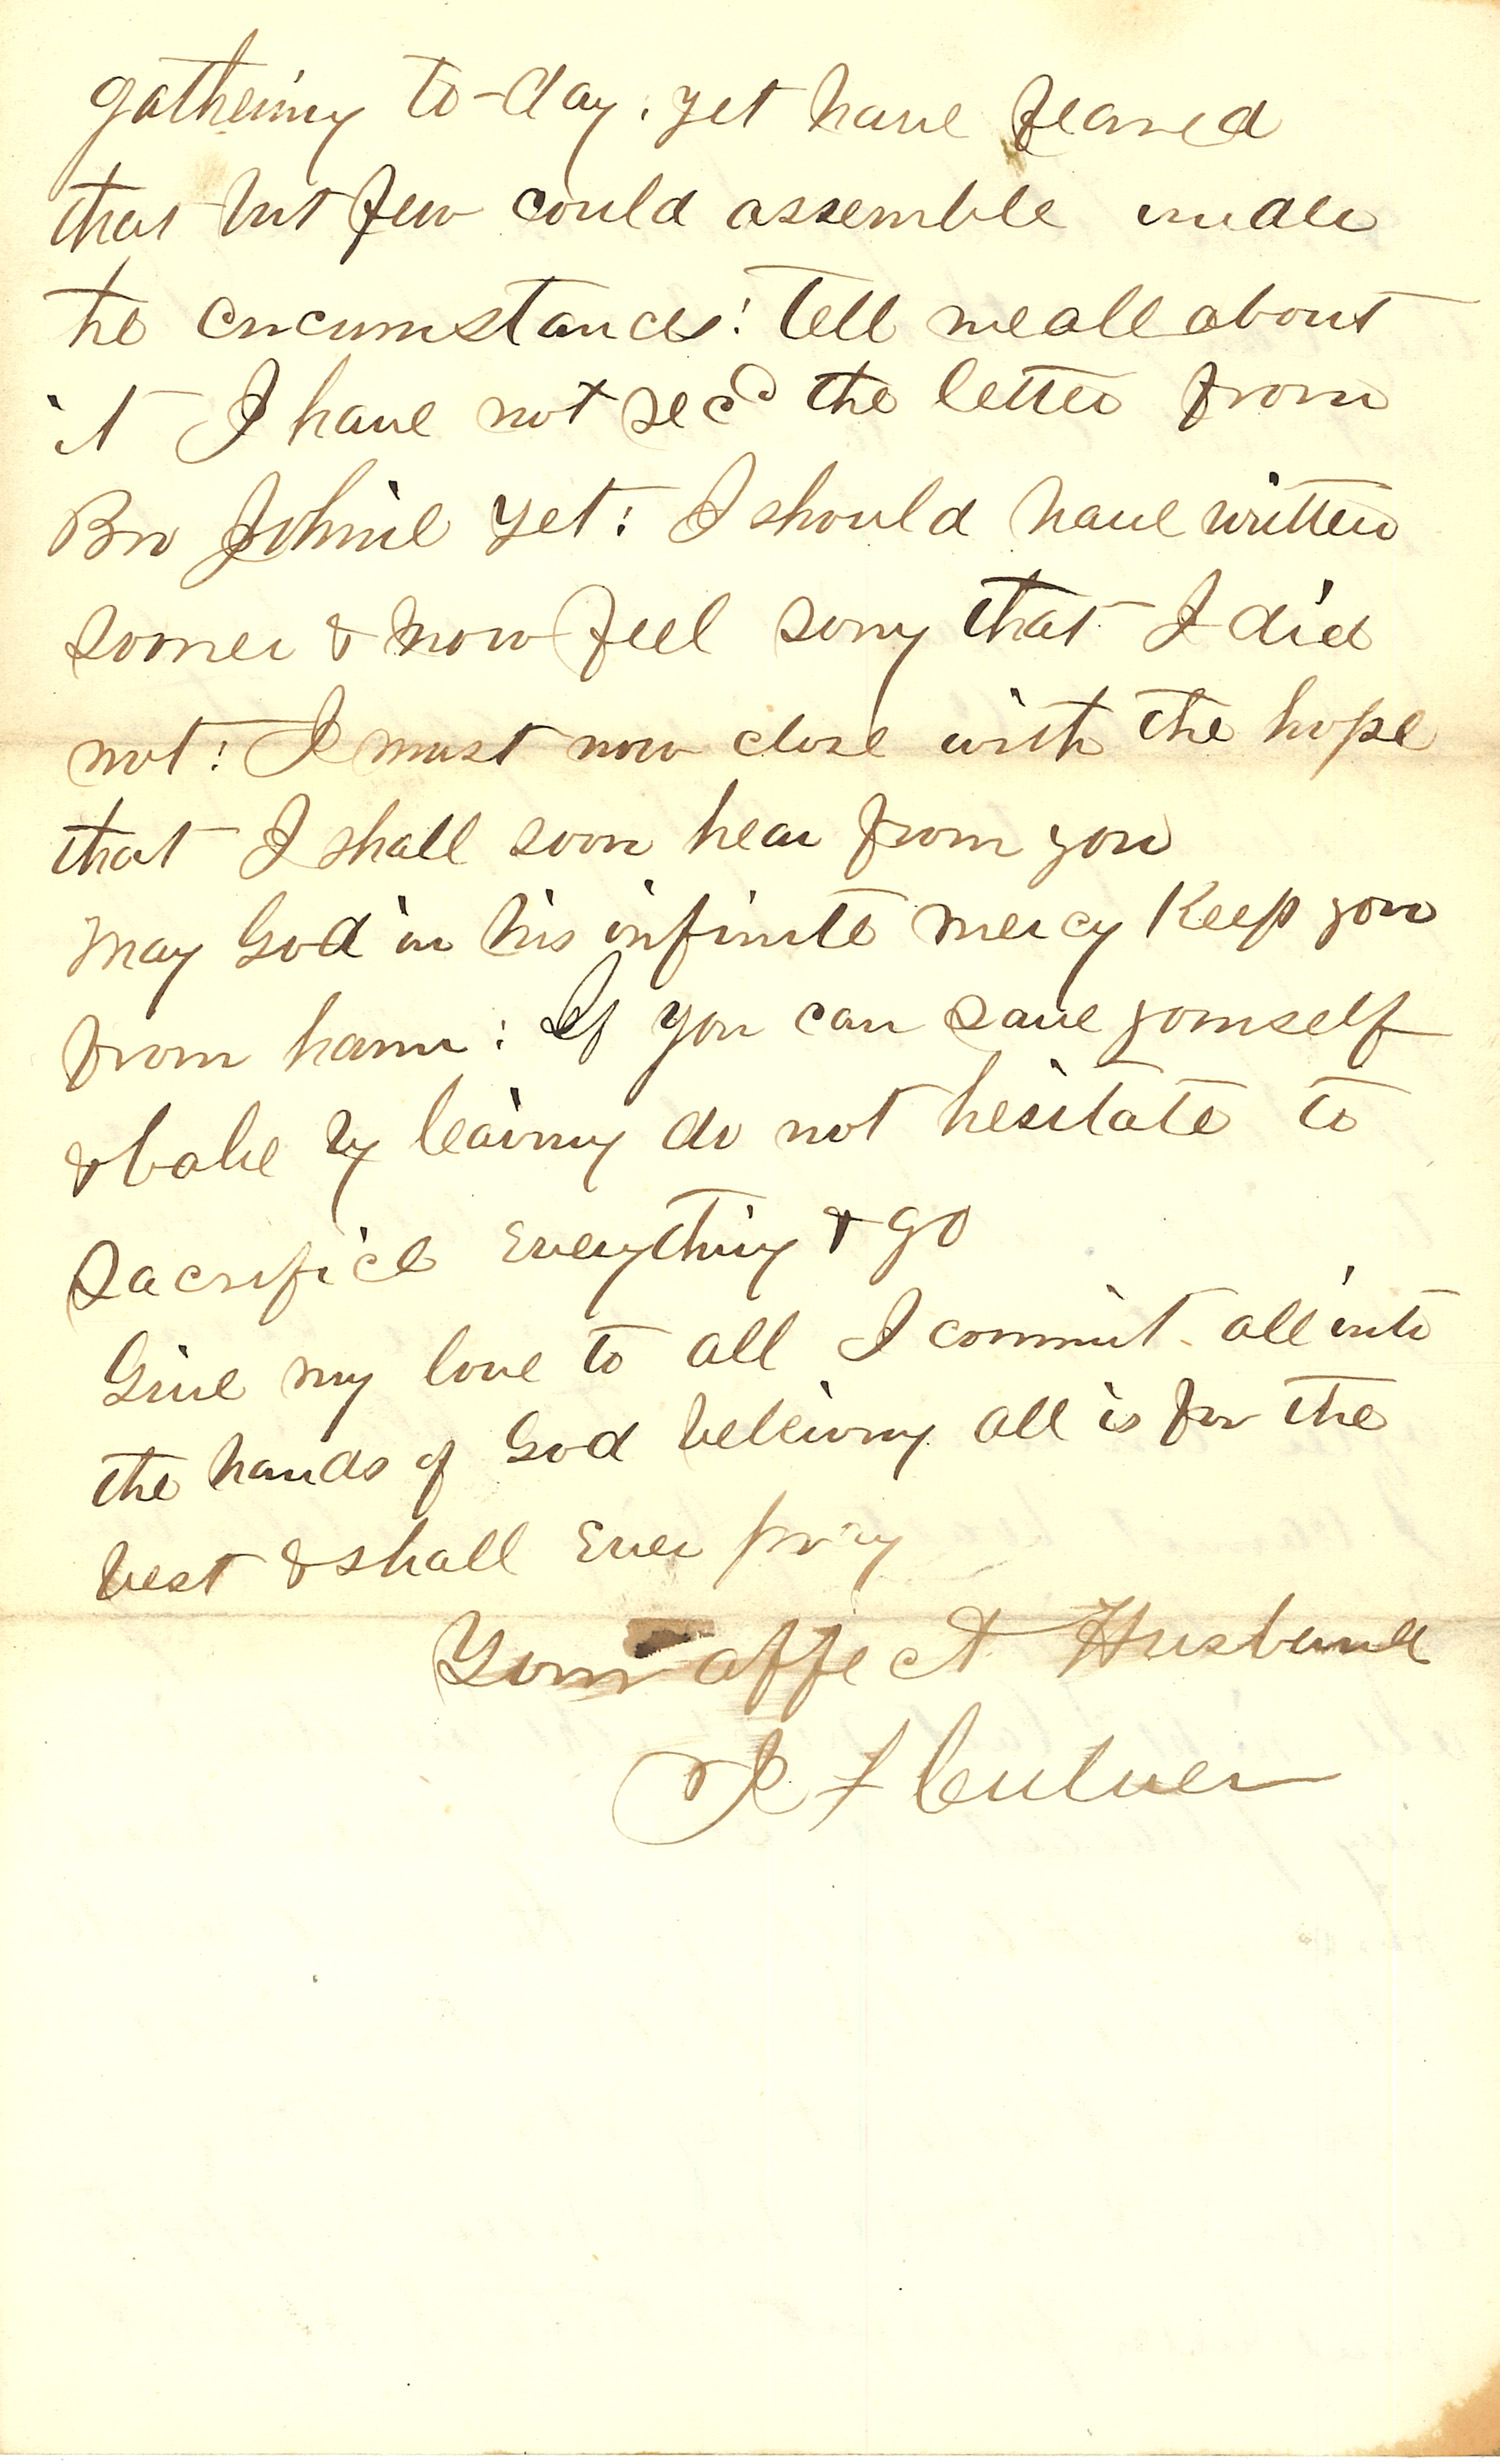 Joseph Culver Letter, December 25, 1862, Page 4